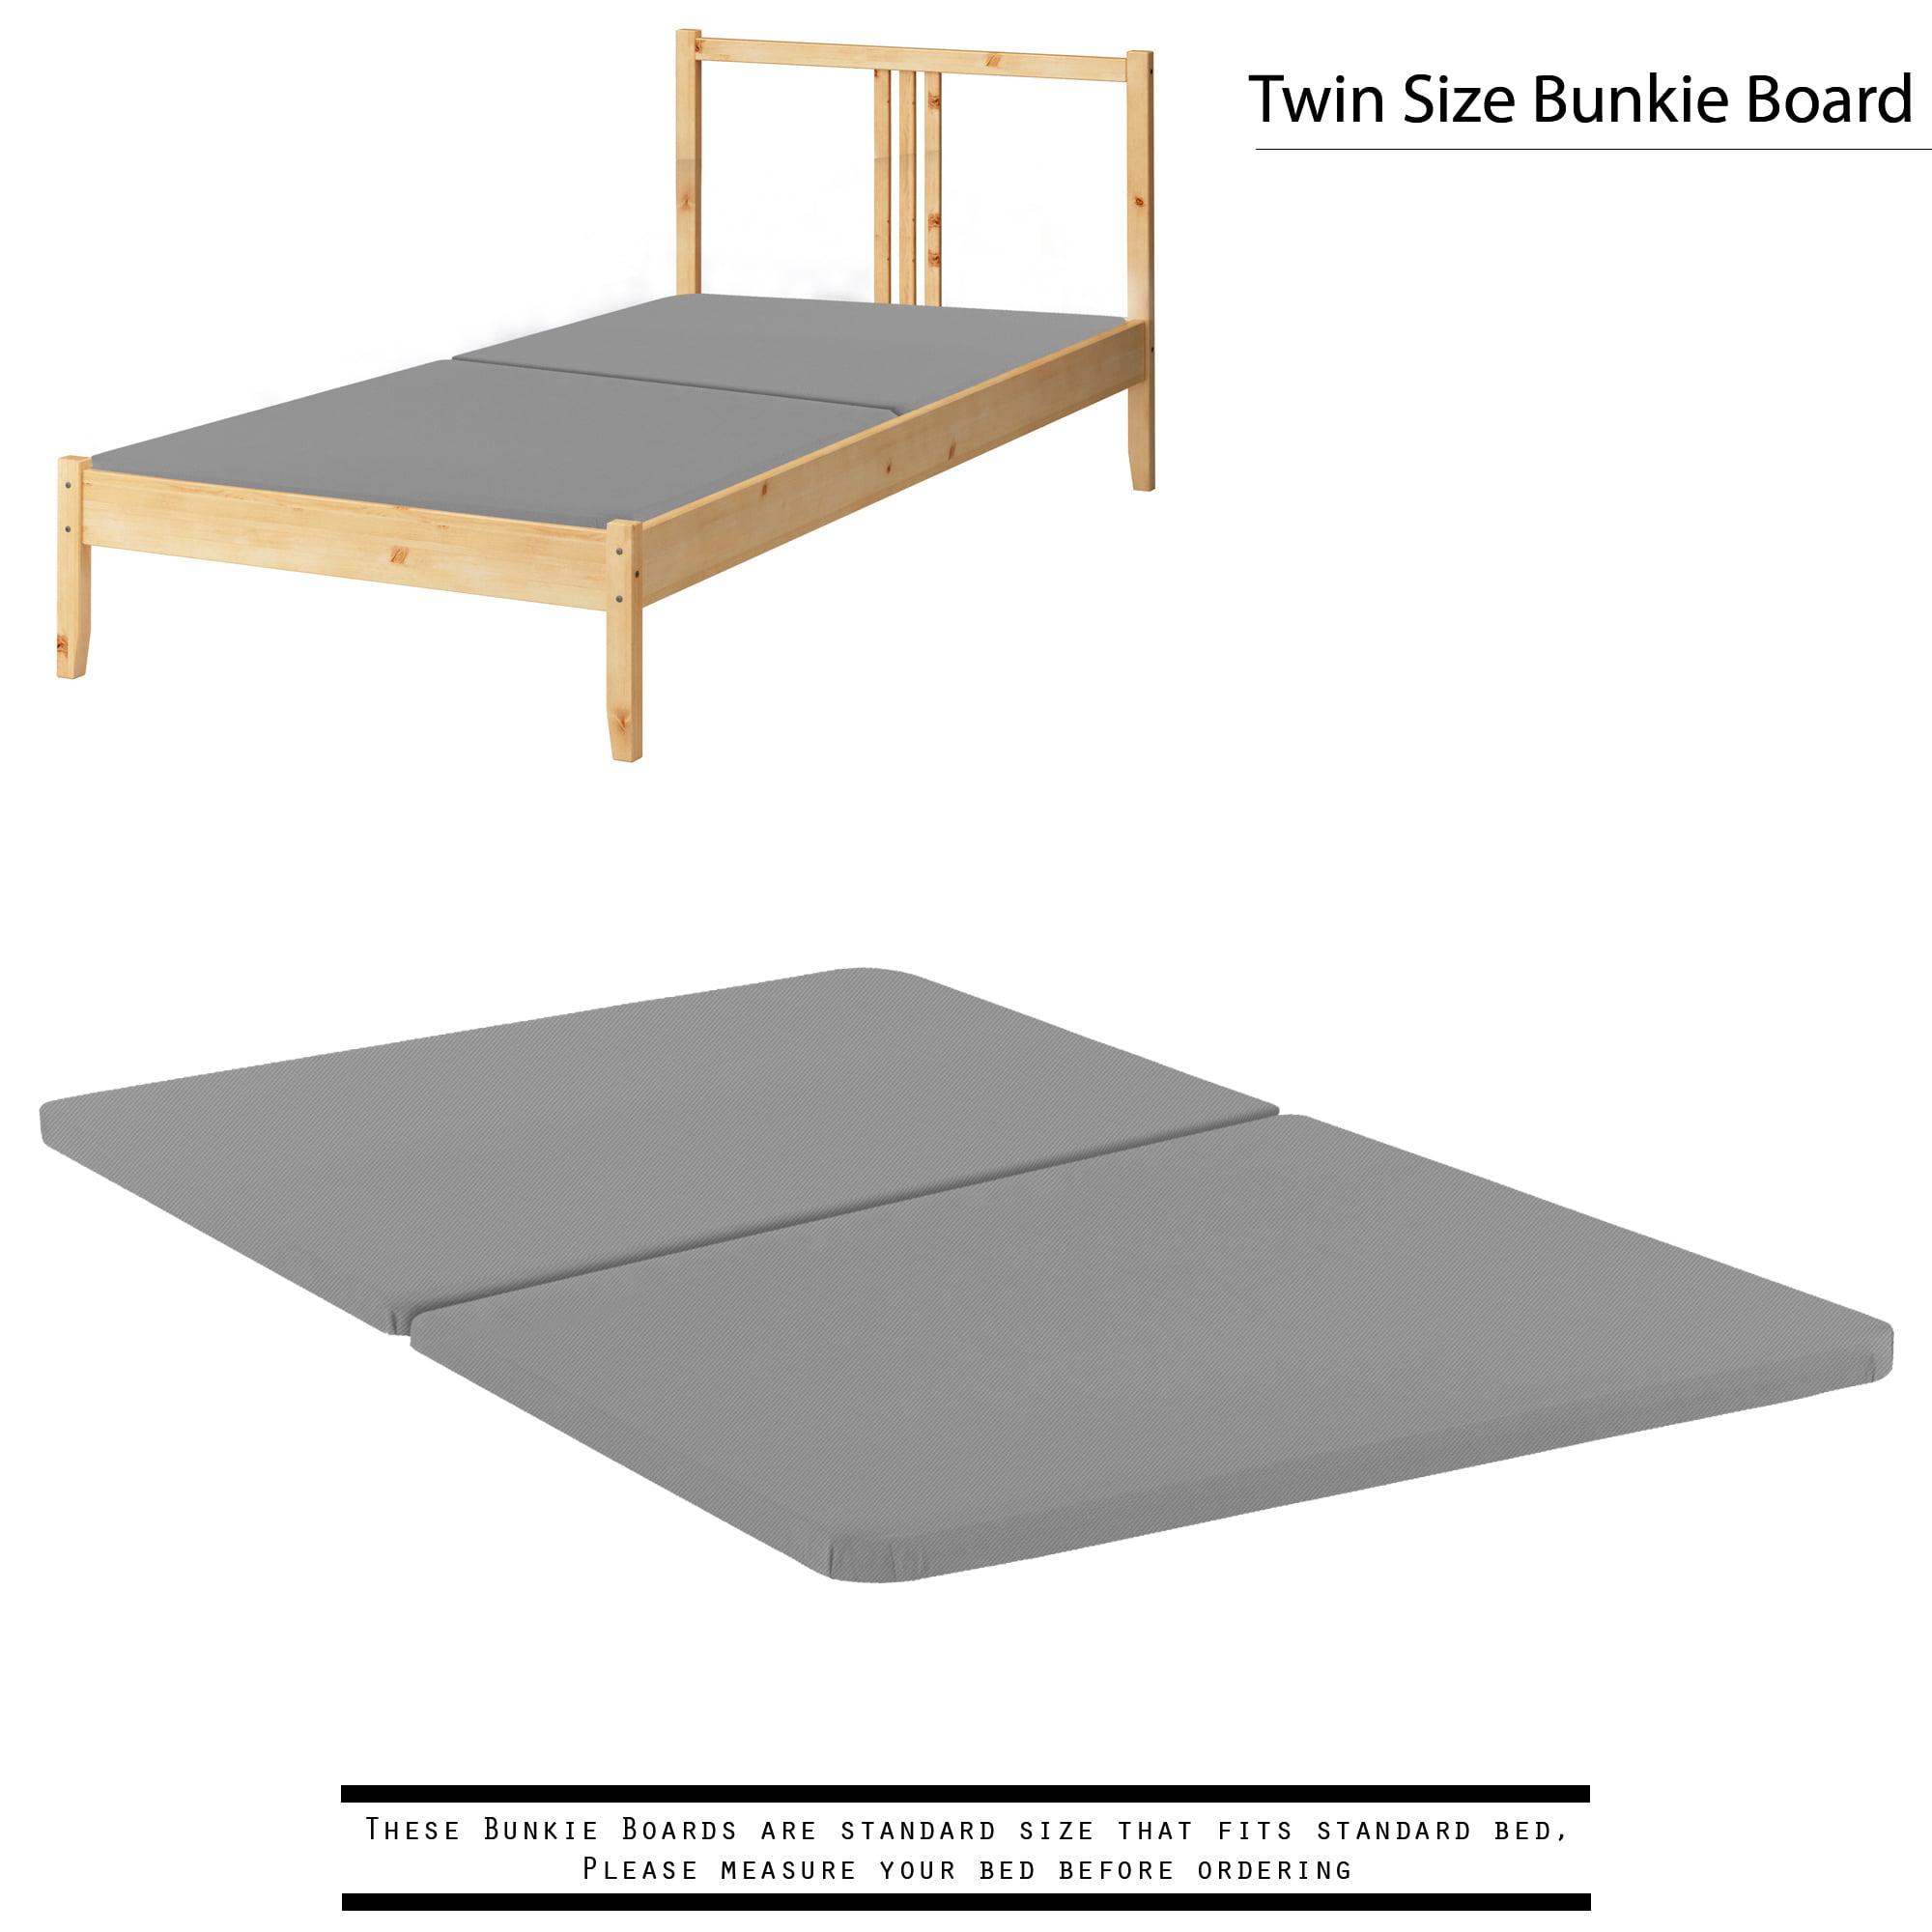 Spinal Solution 1 5 Inch Split Wood Bunkie Board Slats Mattress Bed Support Fits Standard Twin Walmart Com Walmart Com